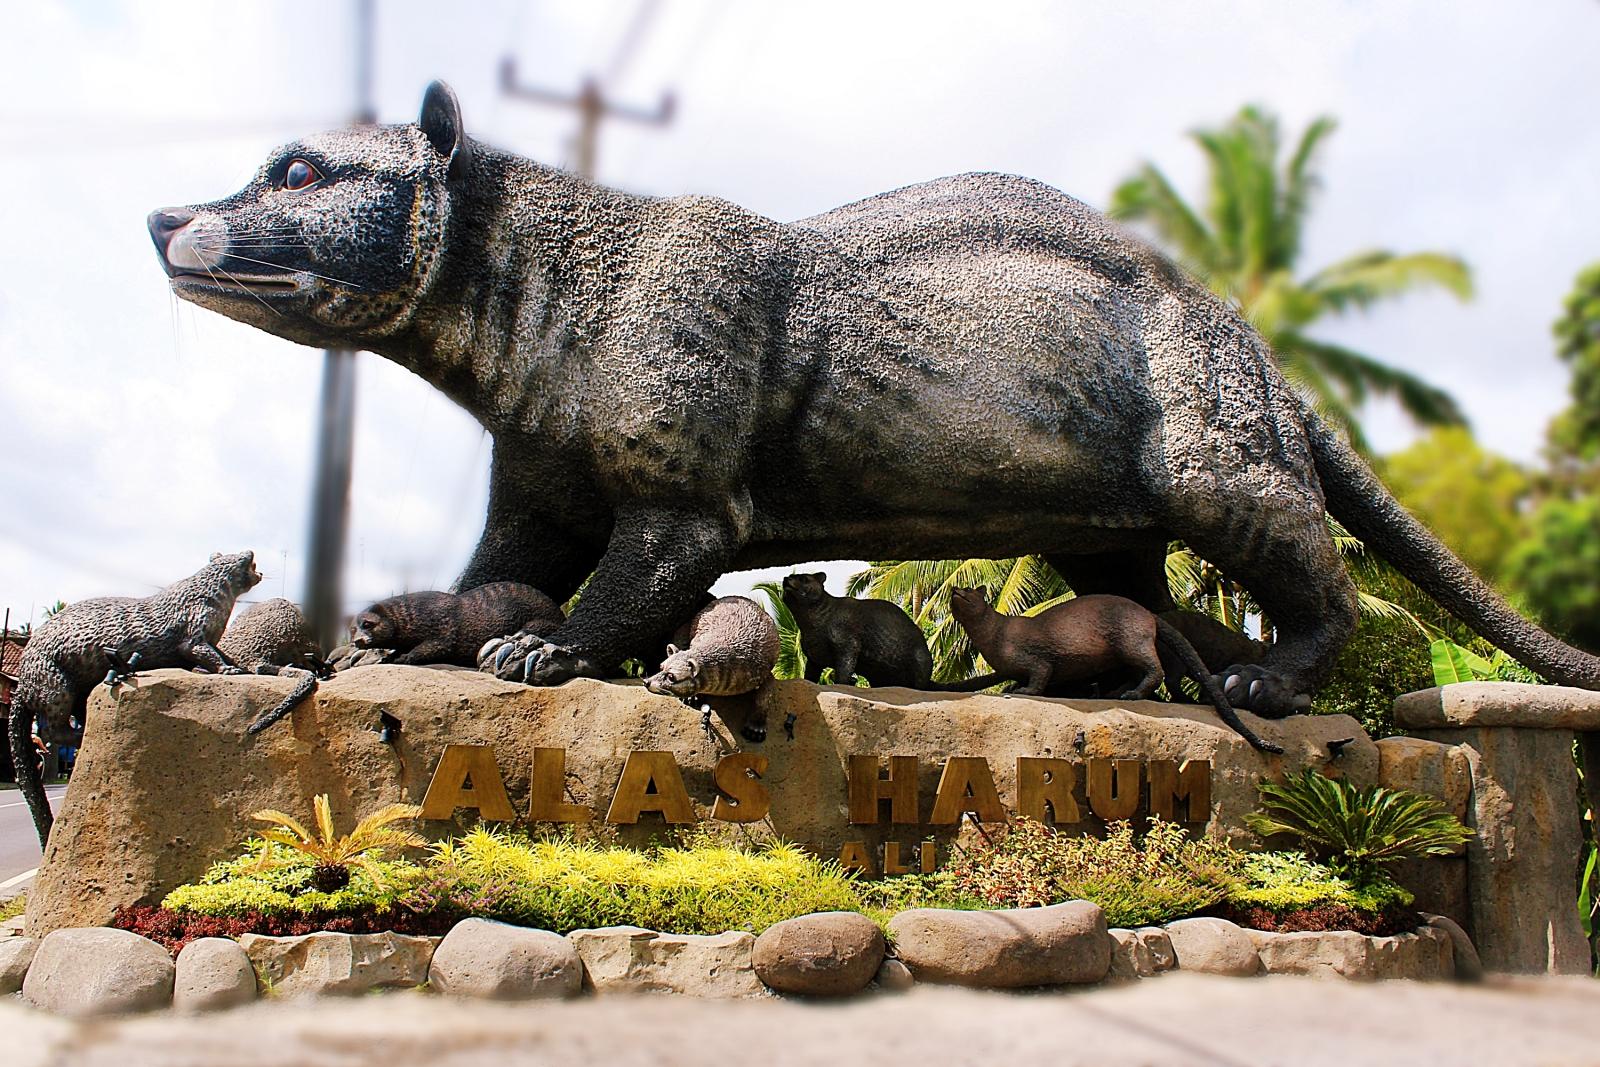 Alas Harum Luwak Statue